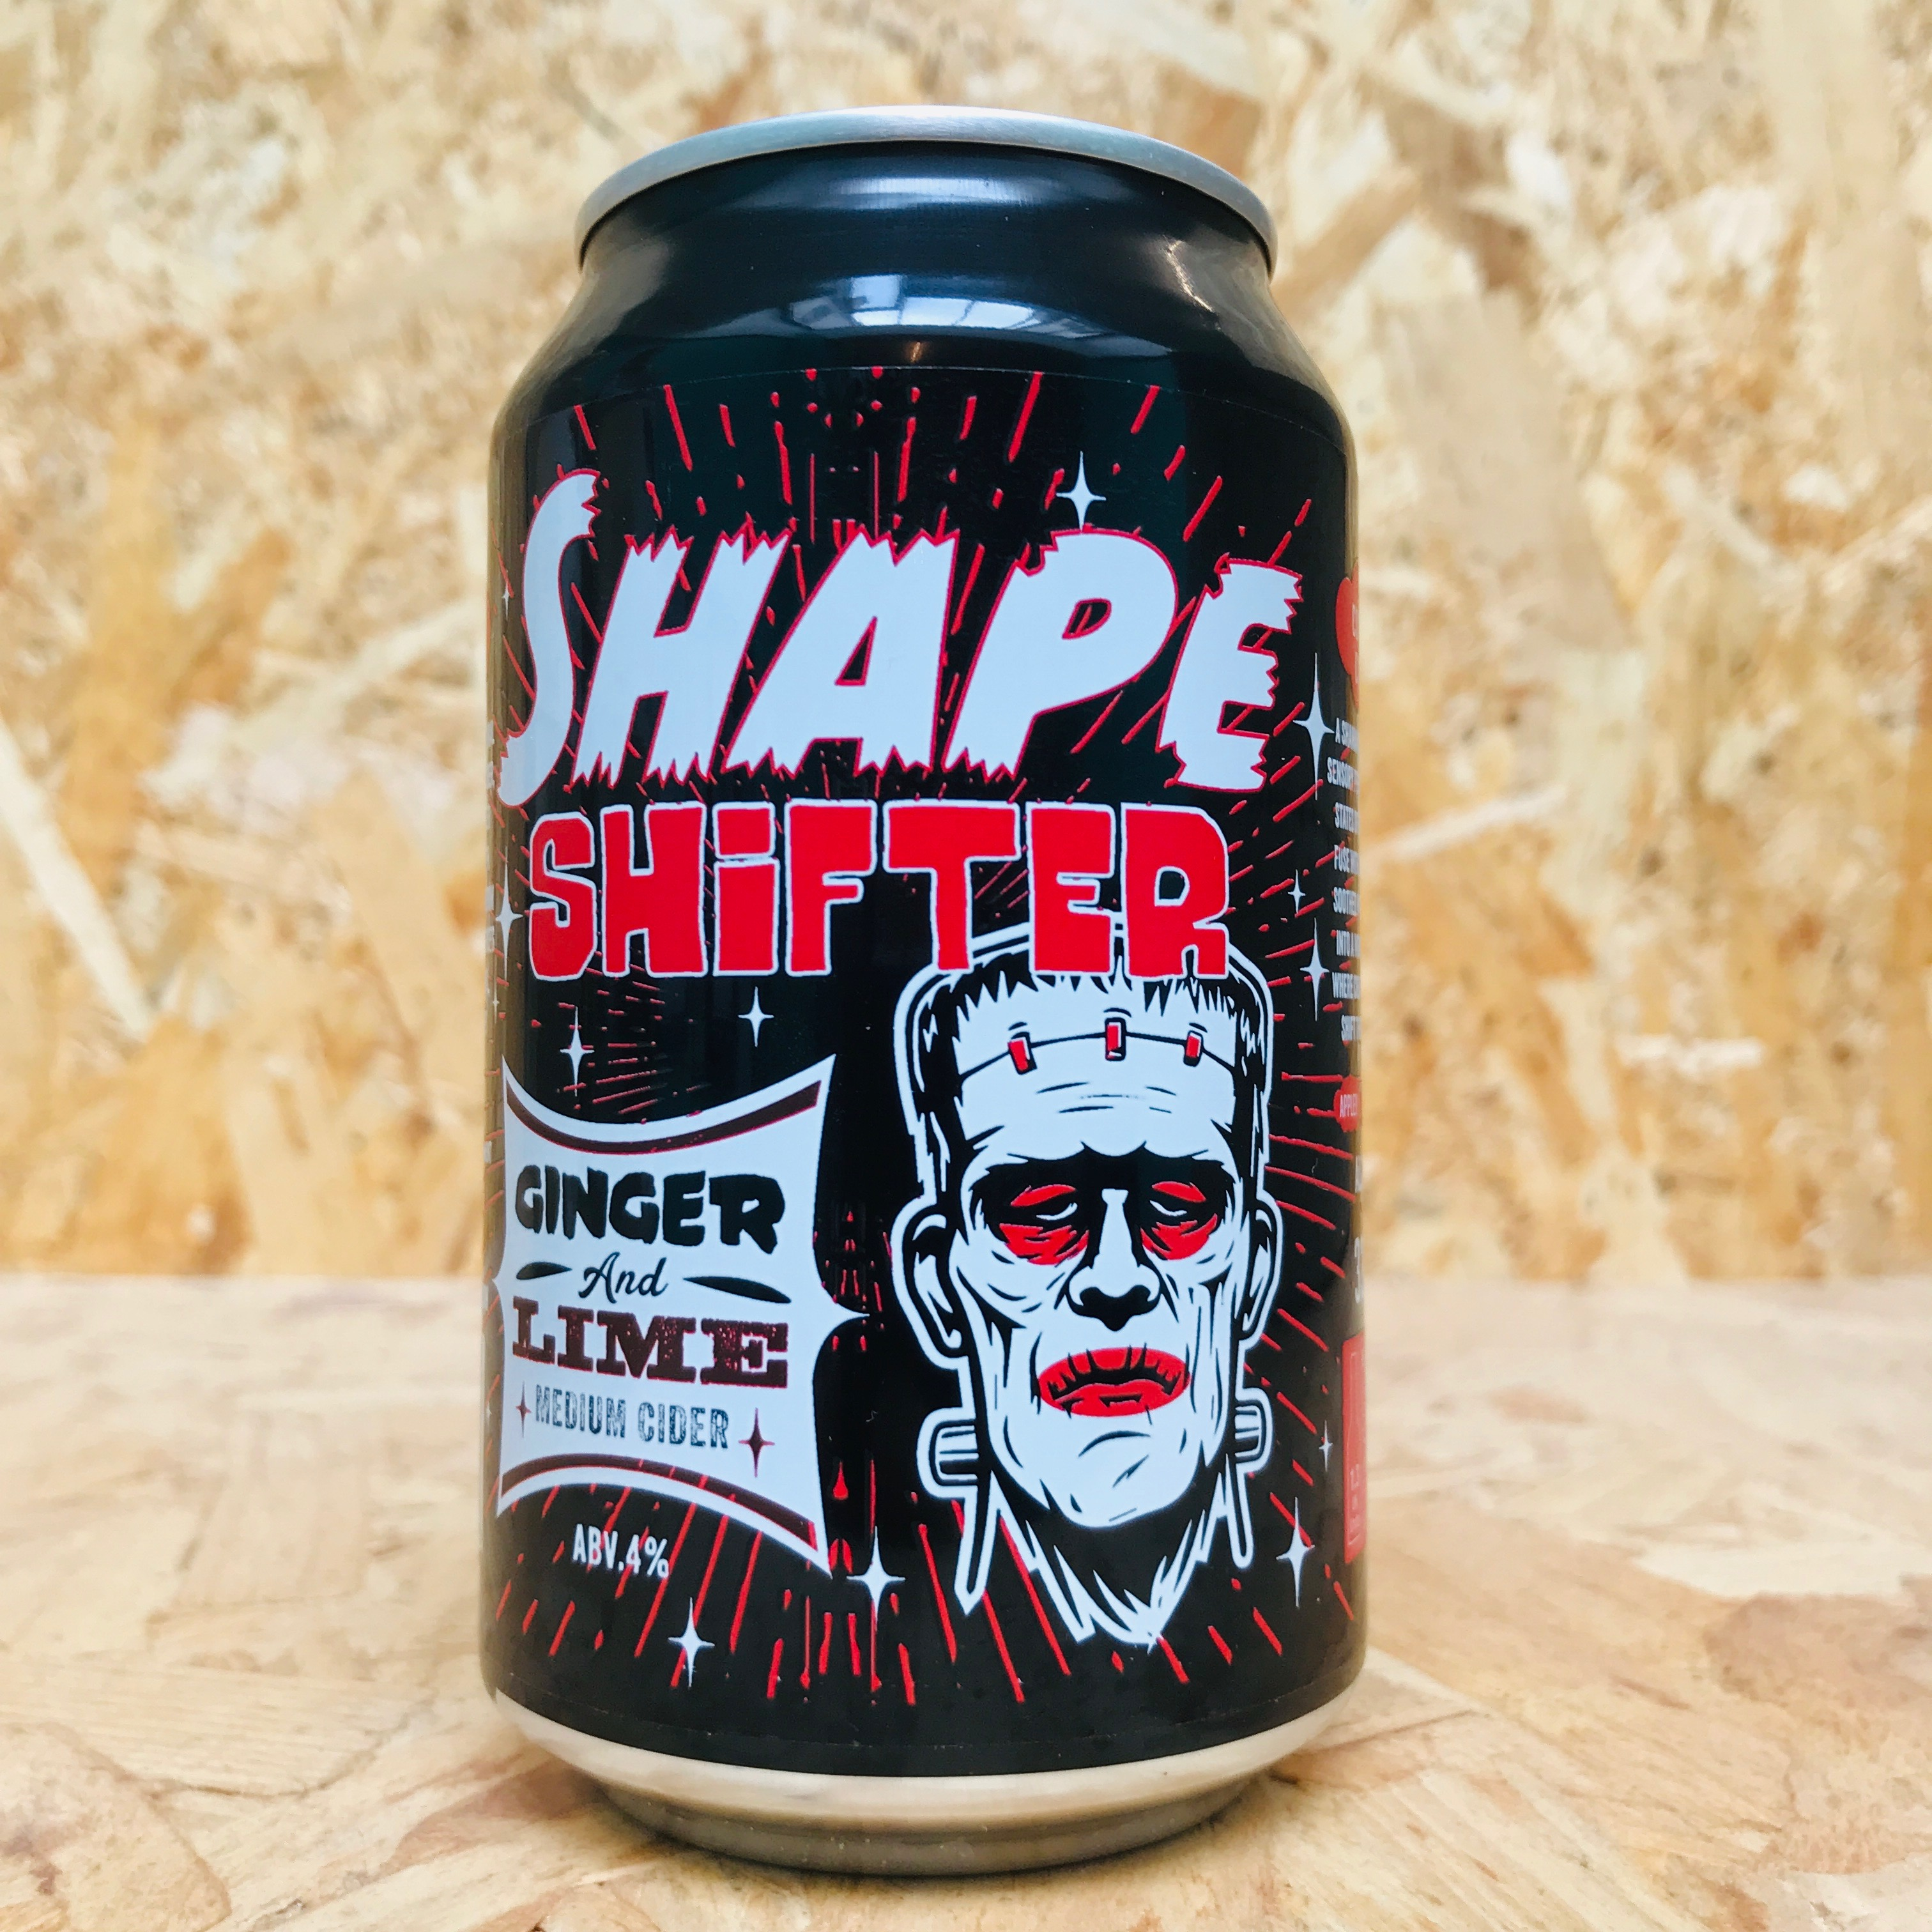 Cotswold Cider Co - Shape Shifter